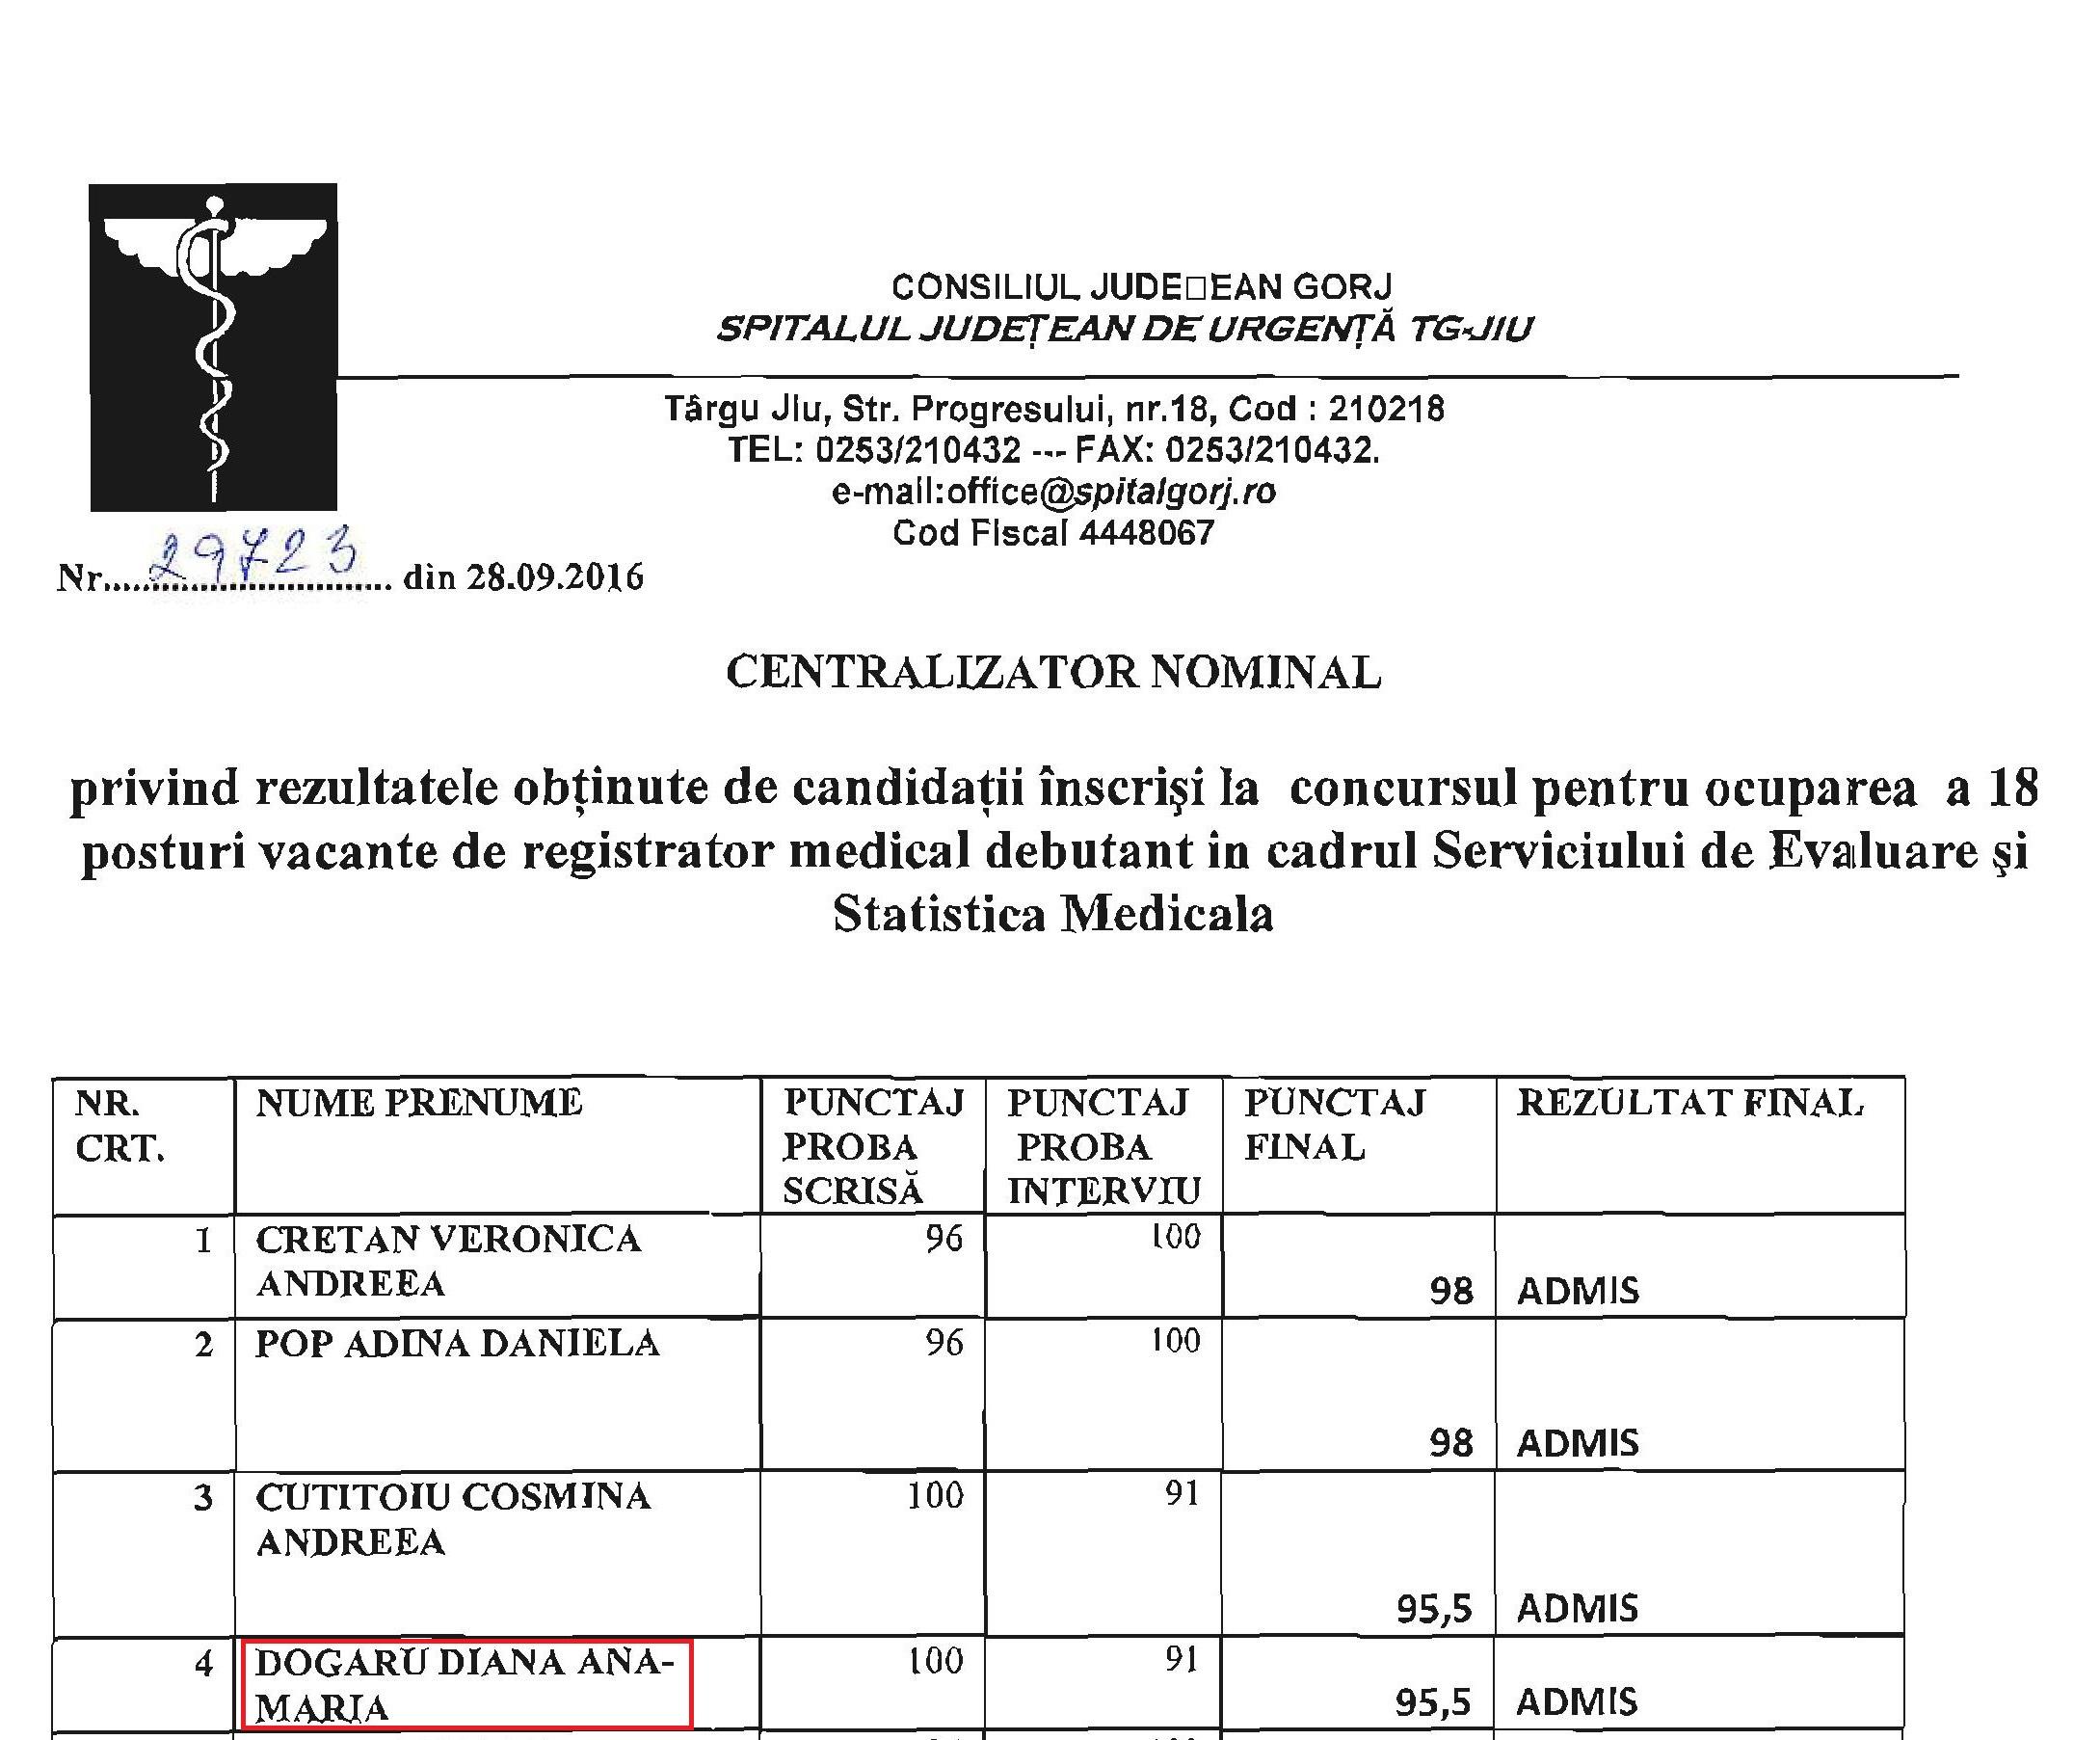 centralizator-nominal-rezultate-registratori-medicali-28sep2016-page-001-1